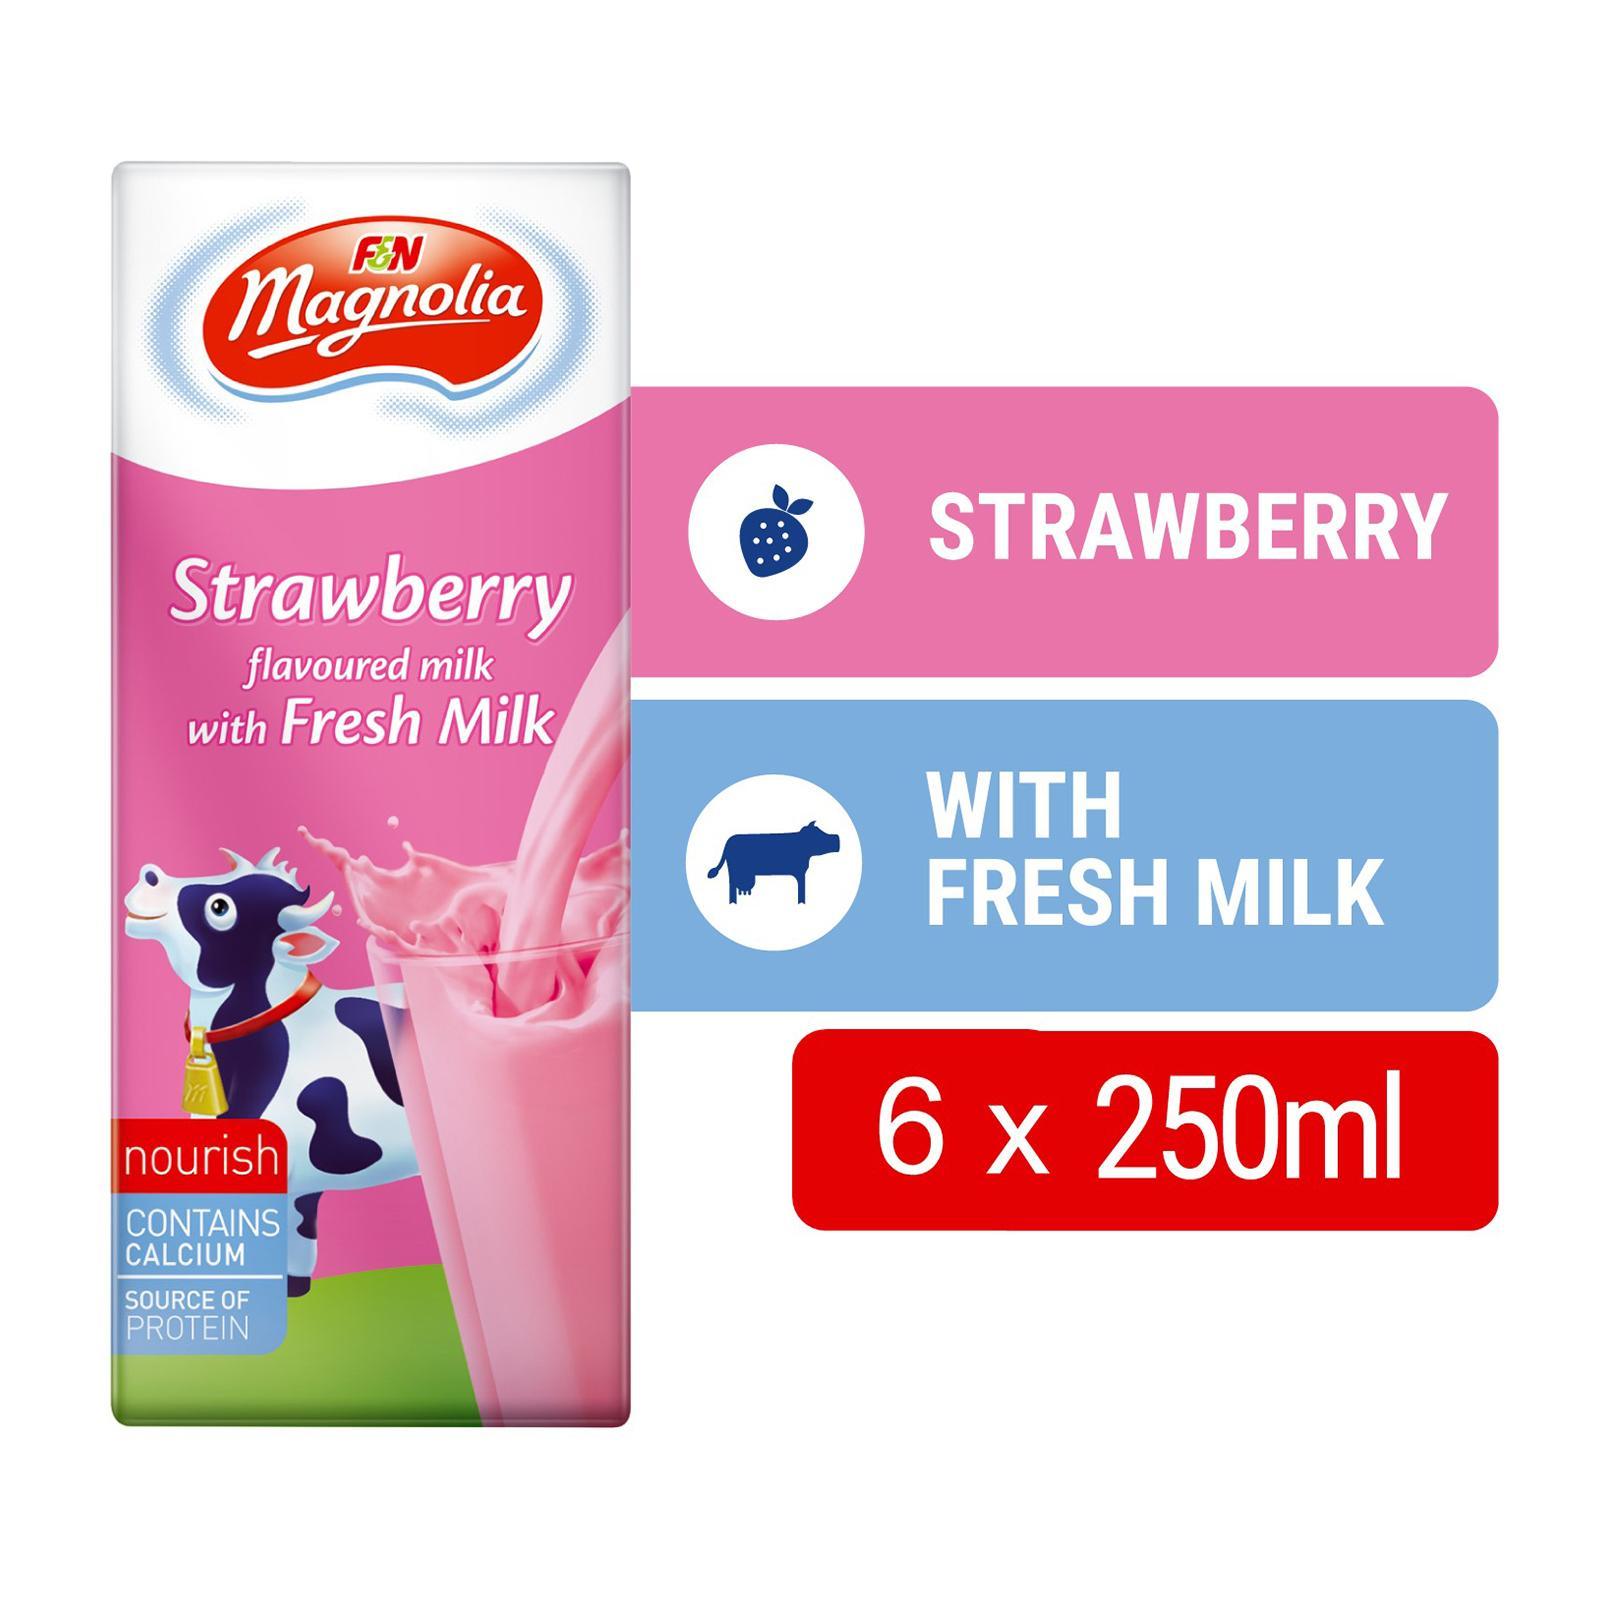 F&N Magnolia Full Cream Milk Strawberry UHT Milk Packet Drink